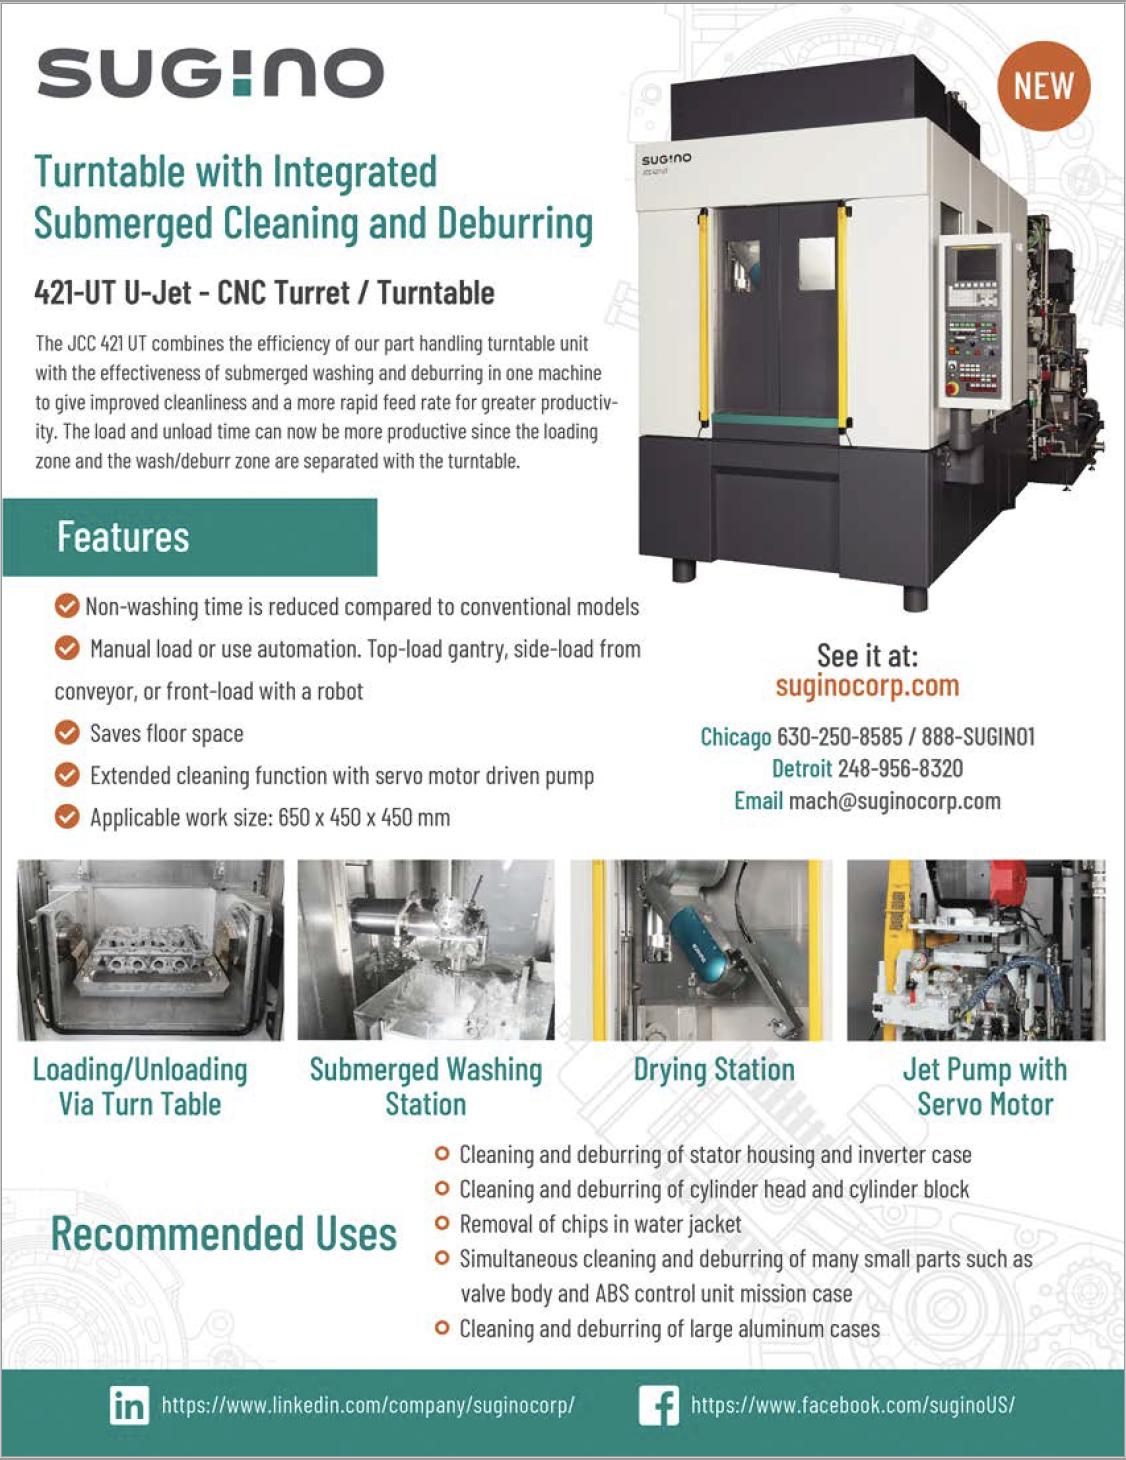 Sugino JCC 421-UT Submerged Cleaning Deburring